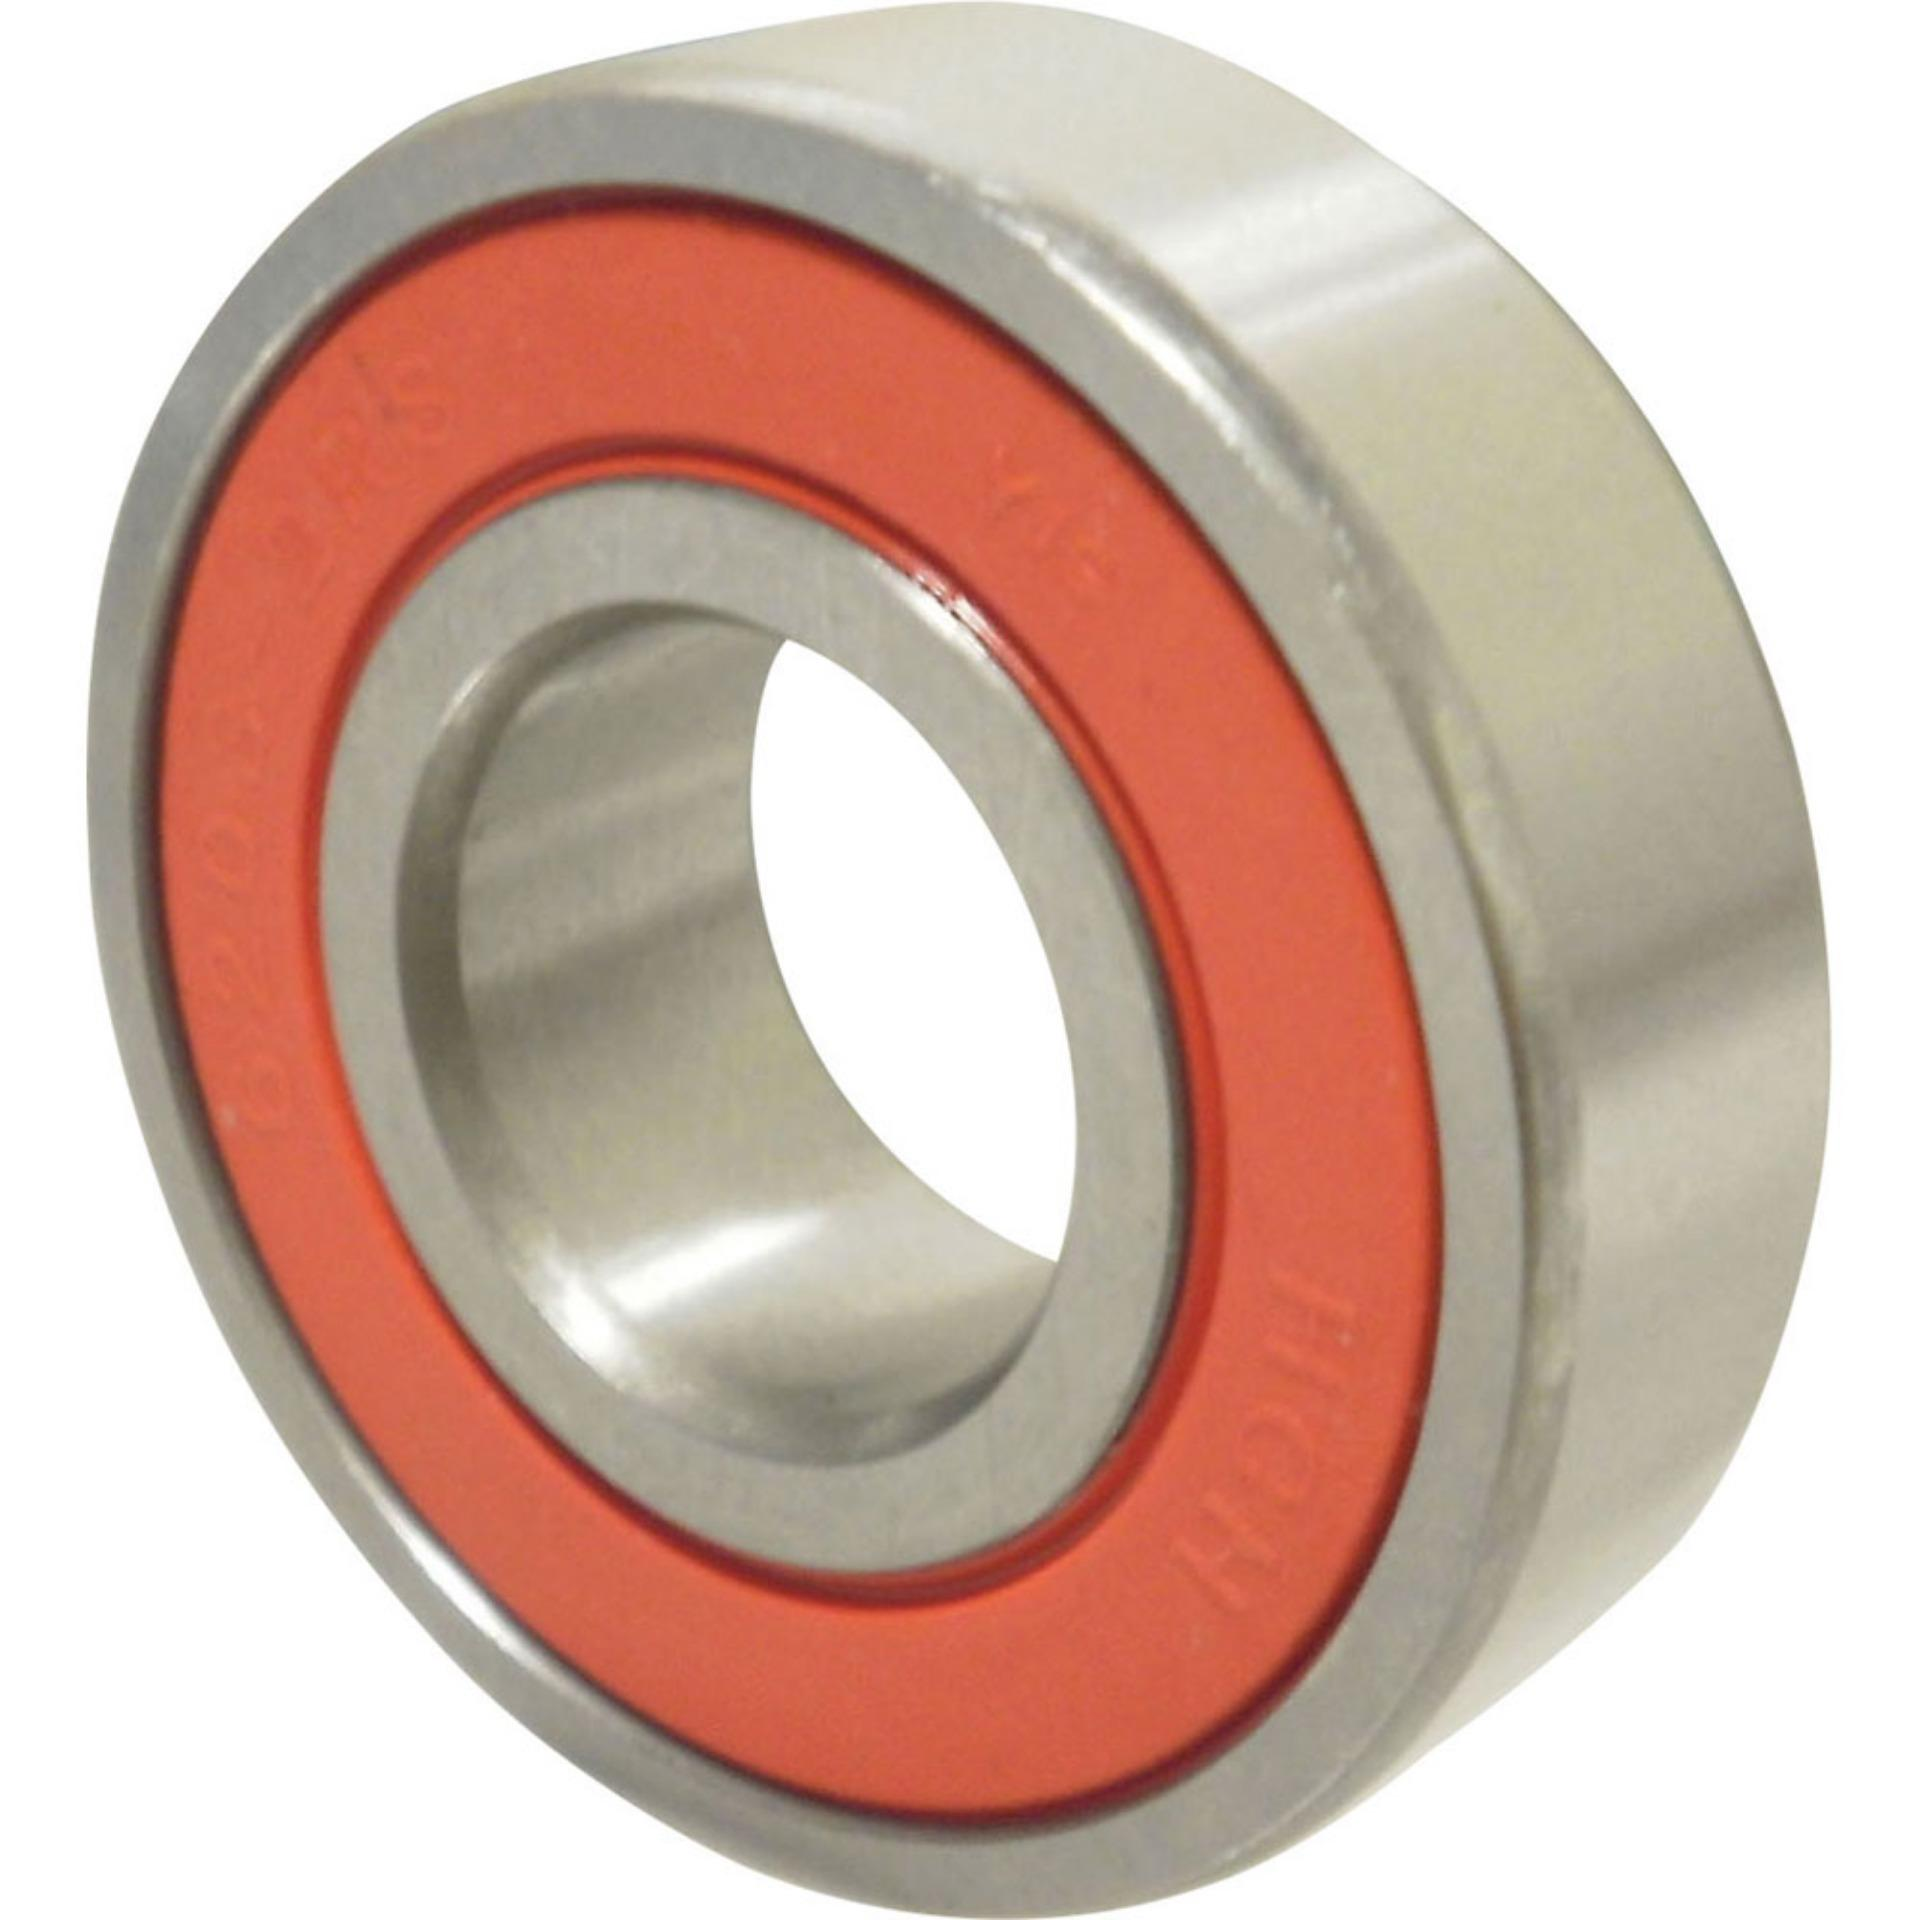 OsakaSpirit Ball Bearing 6200 2RS Series, Both Sides Contact Rubber Seal Type 6202-2RS